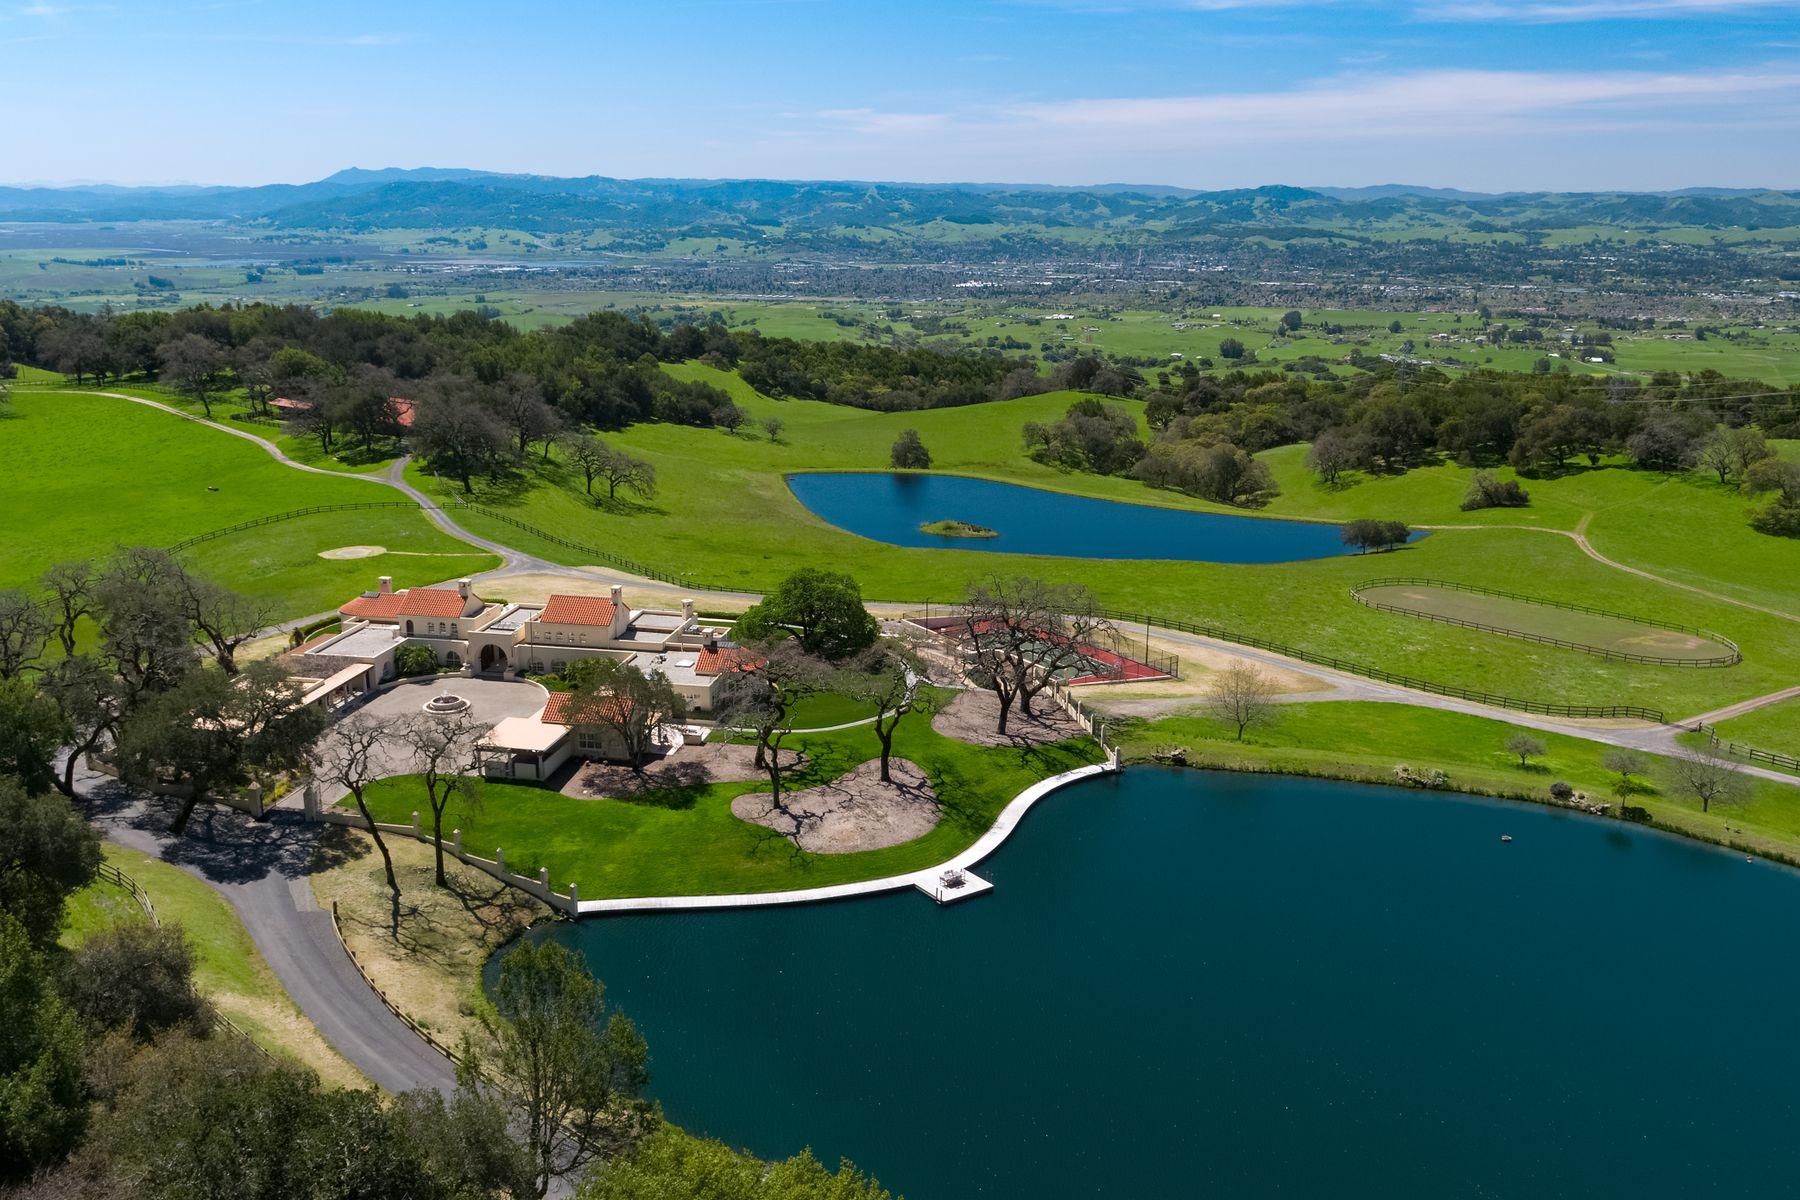 Single Family Homes for Sale at Sonoma Mountain Ranch Petaluma, California 94954 United States